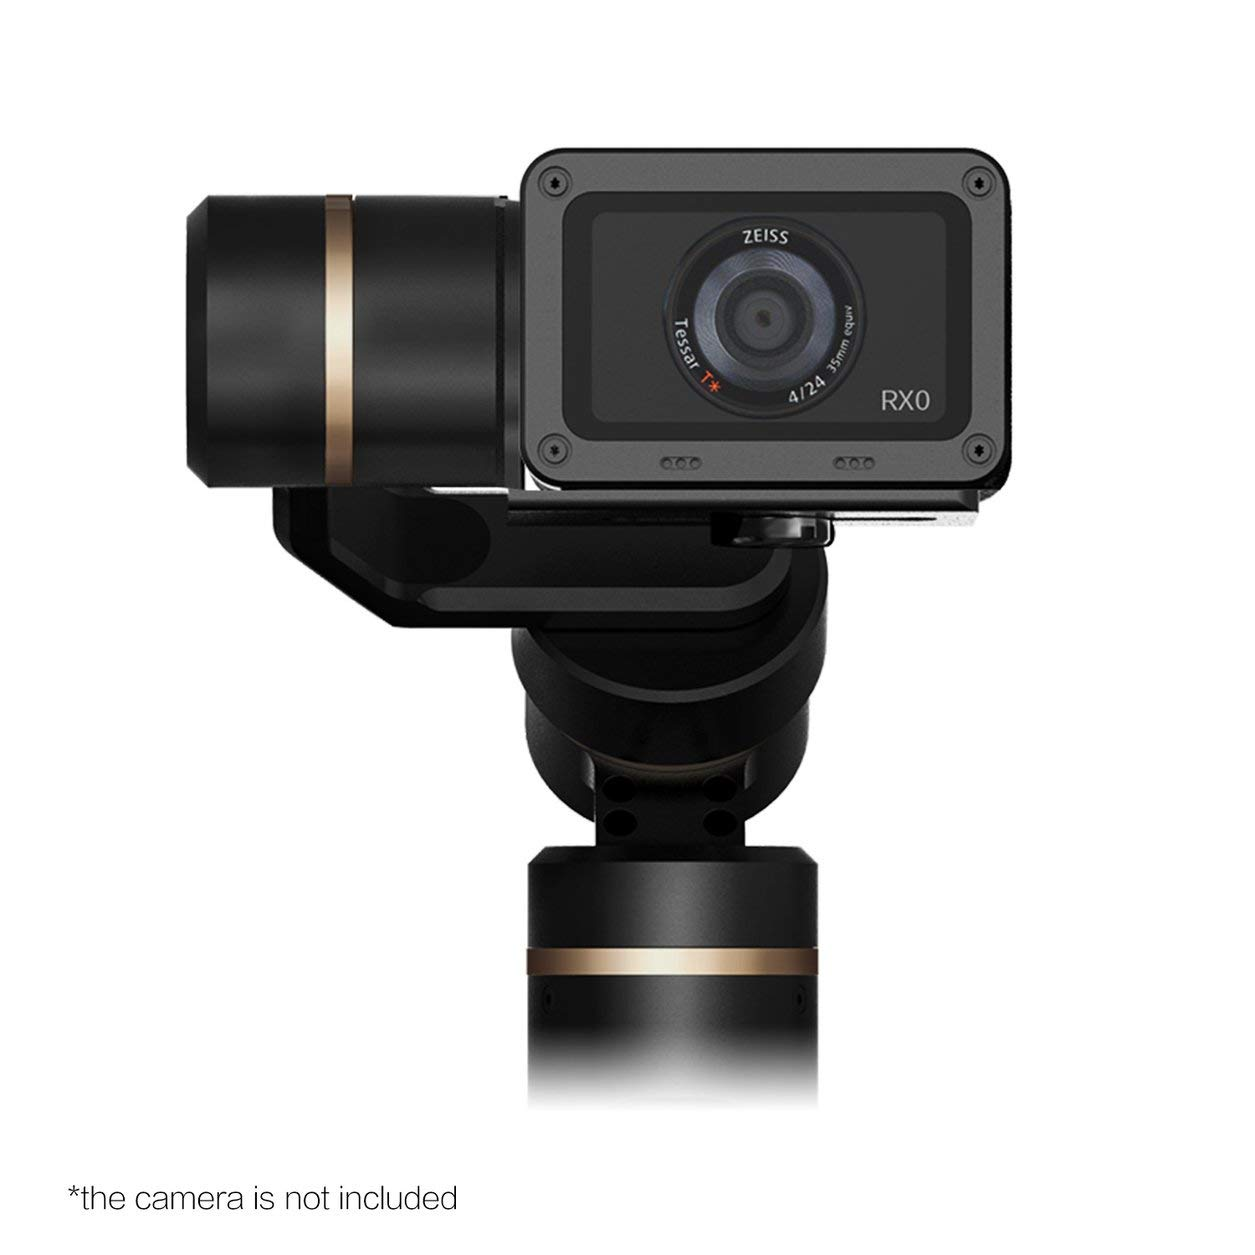 FeiyuTech G6 3軸ハンドヘルドジンバルスタビライザー(GoPro HERO/Xiaomi YI 4K / AEEカメラ用スマートフォン用)(カラー:ブラック)   B07GXK93FD